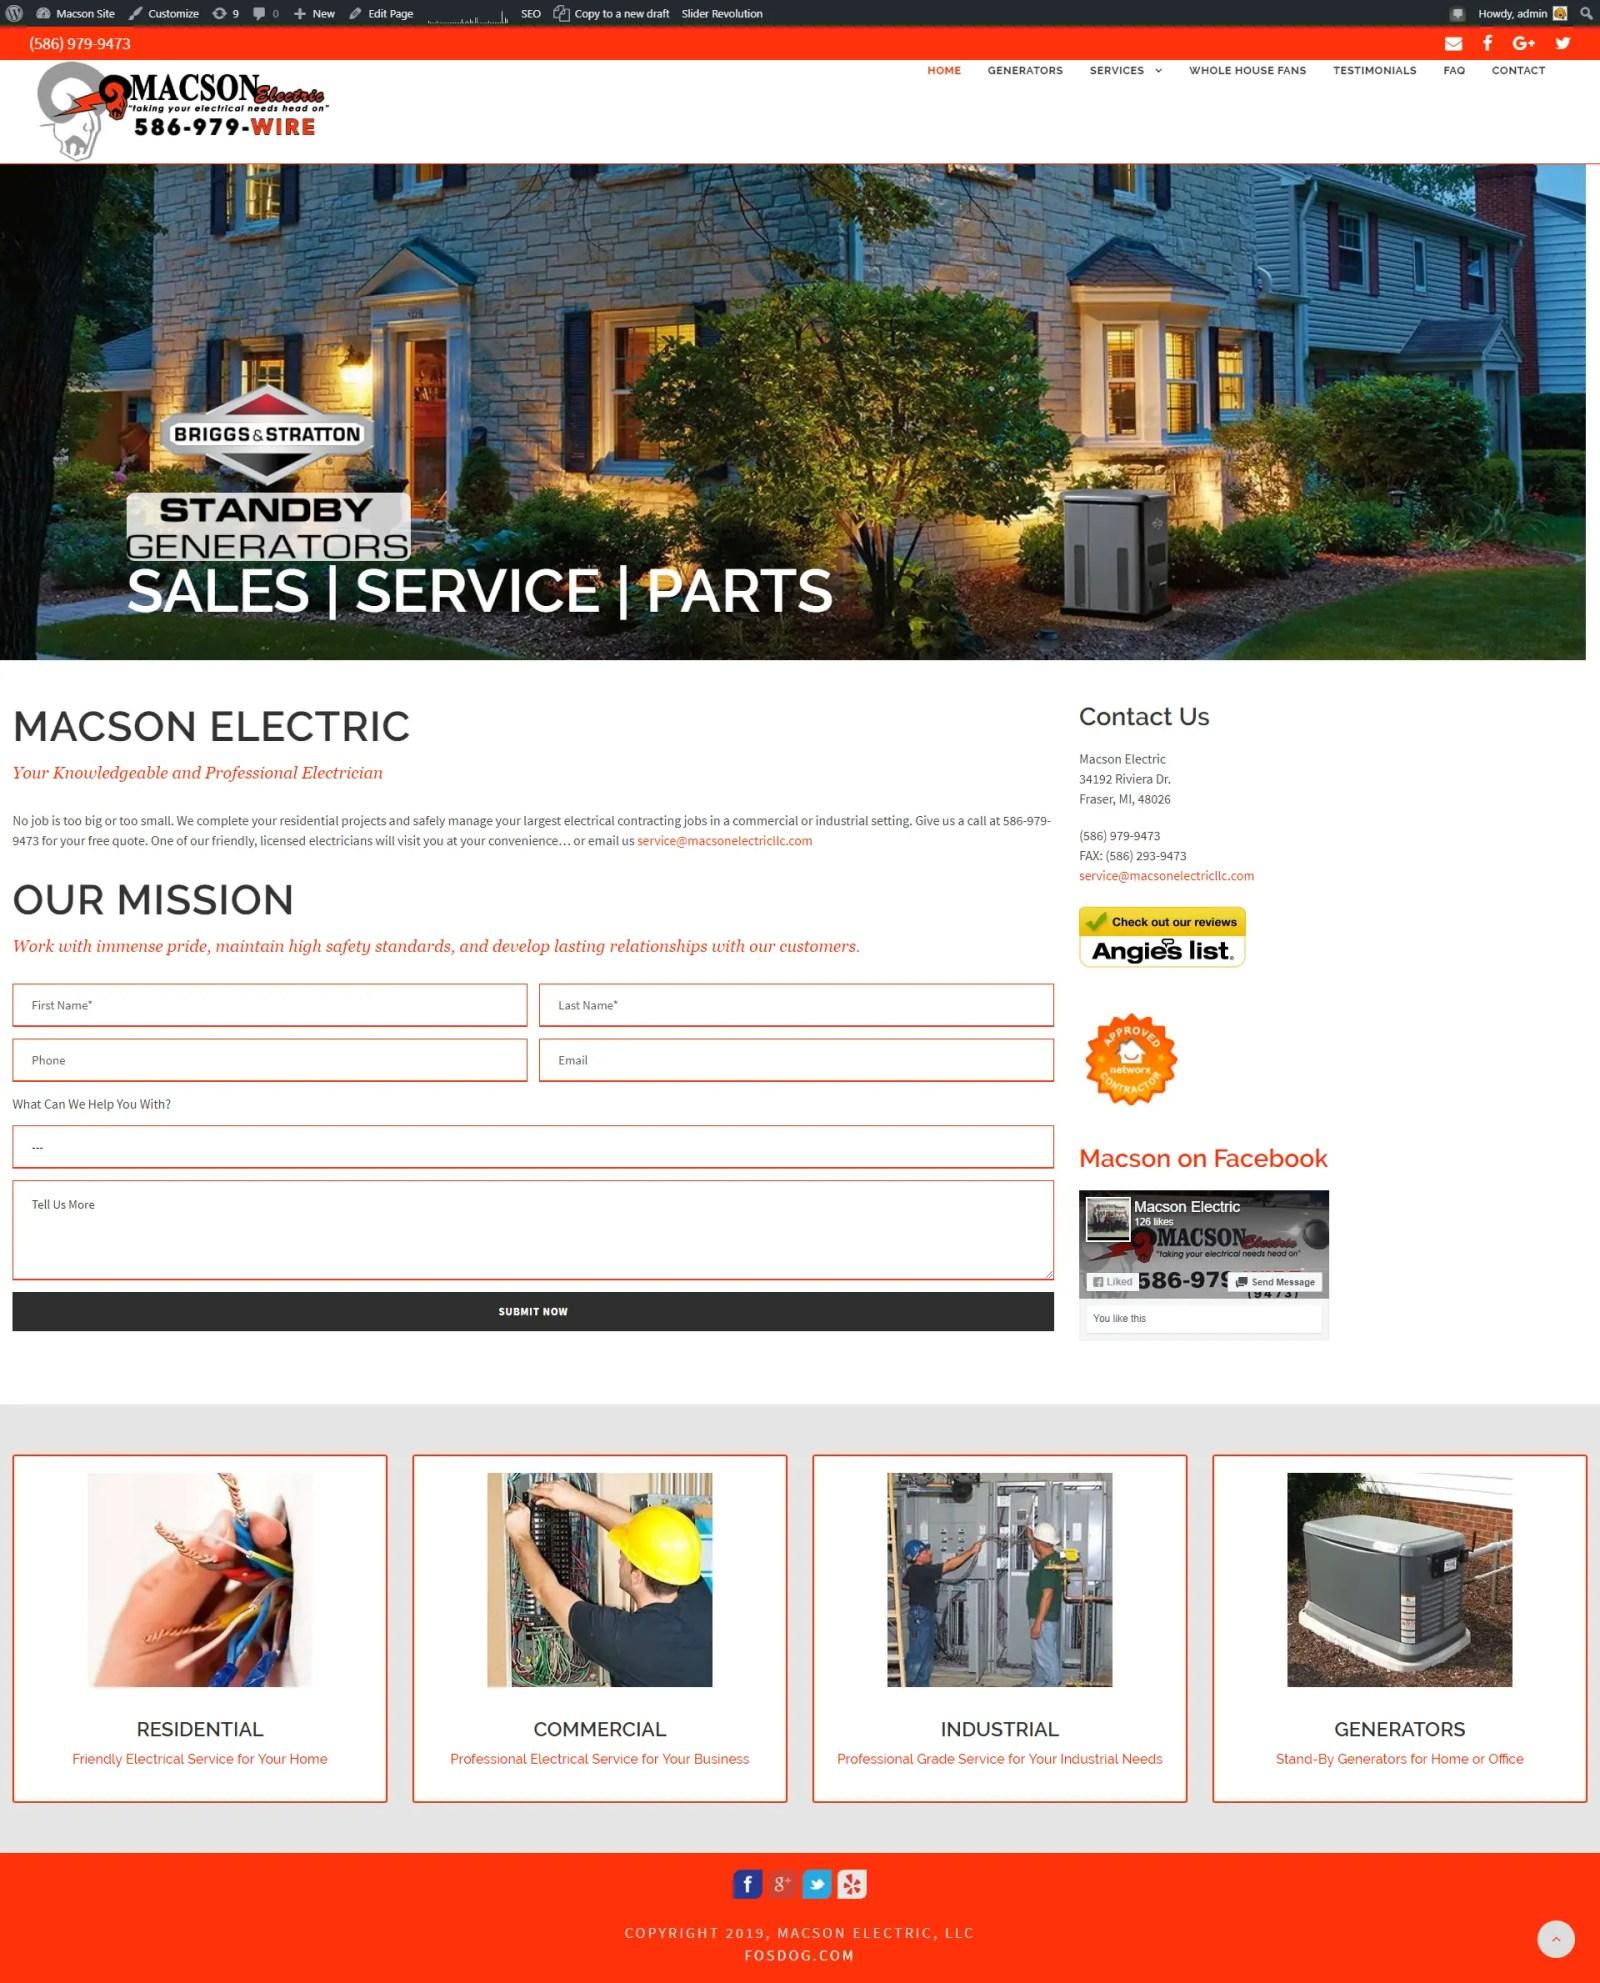 Macson Electric